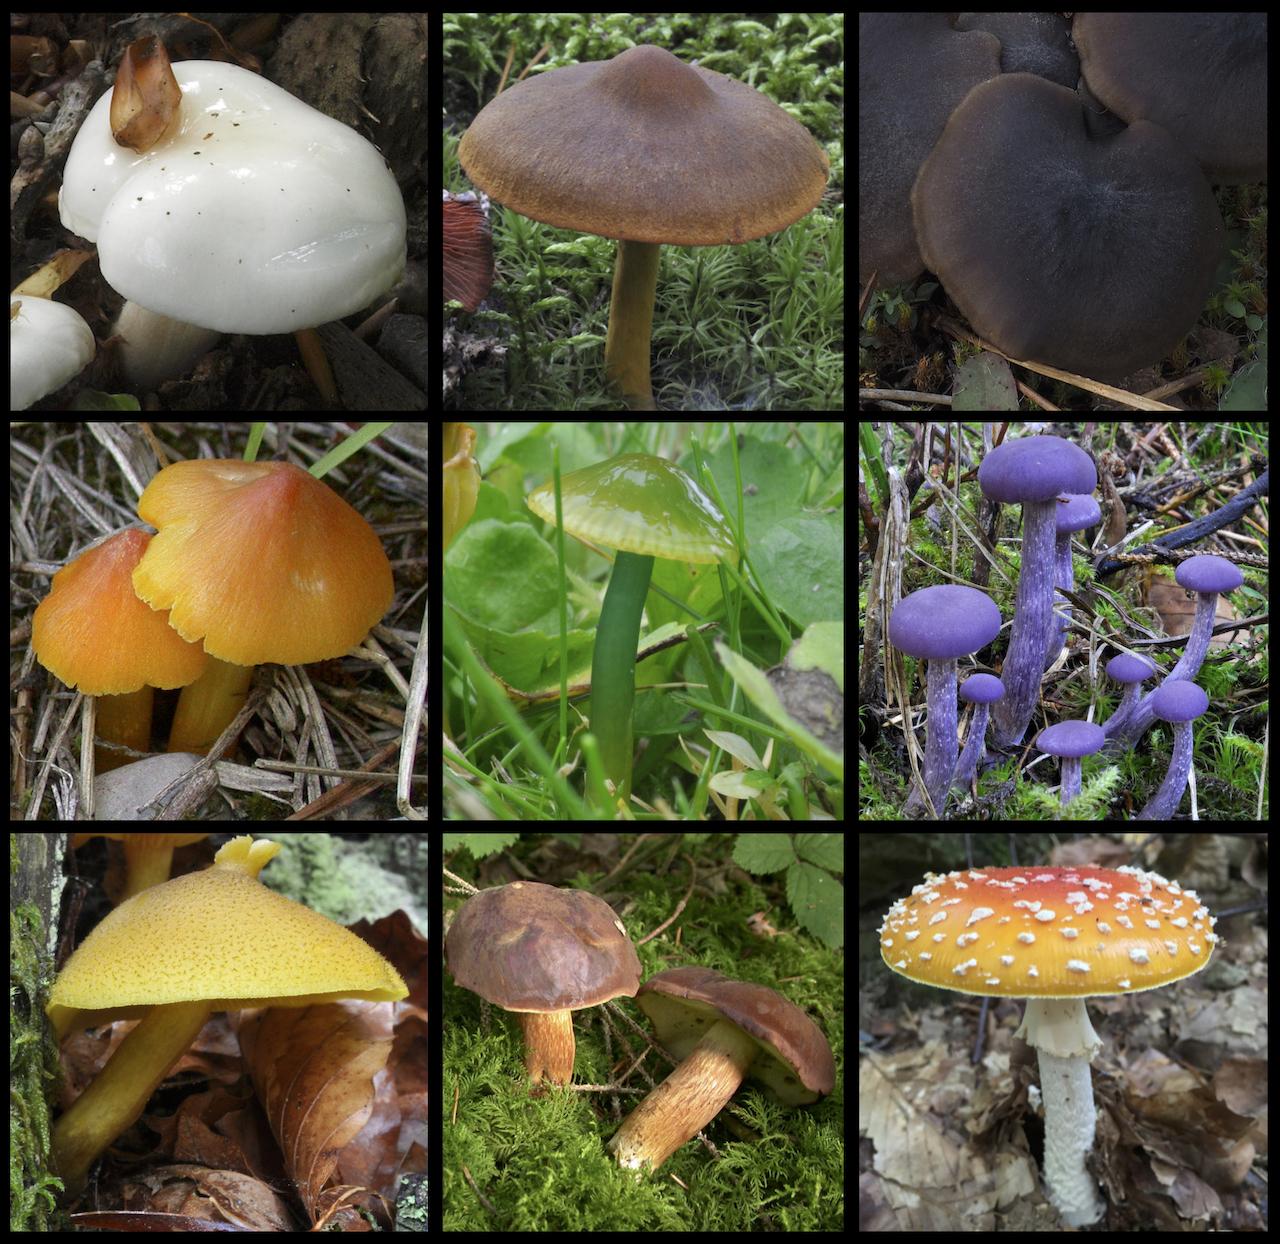 Color diversity of mushrooms